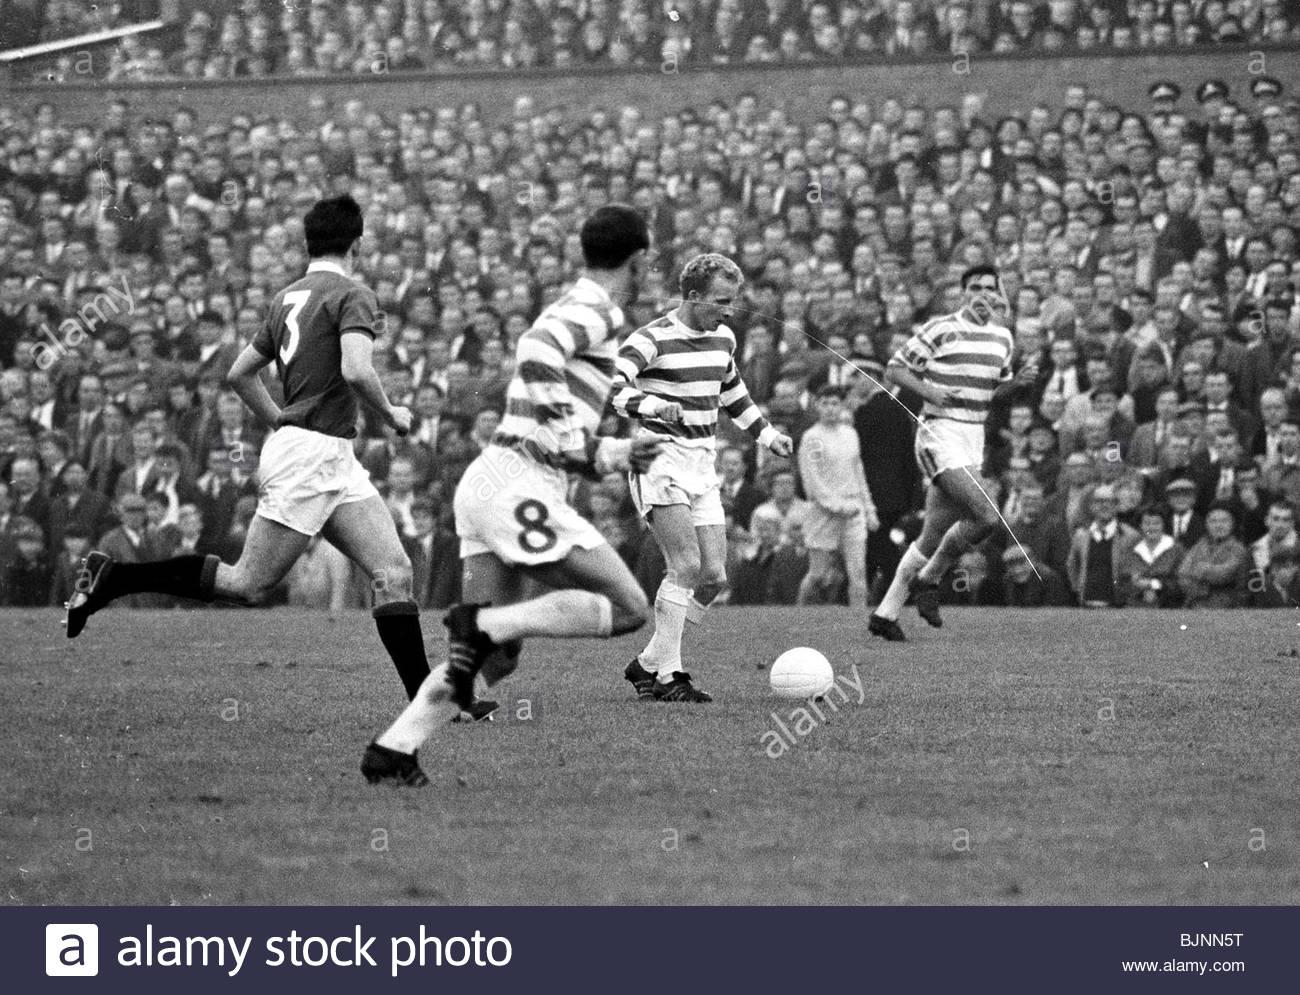 SEASON 1965 1966 CELTIC FC Jimmy Johnstone in action Stock